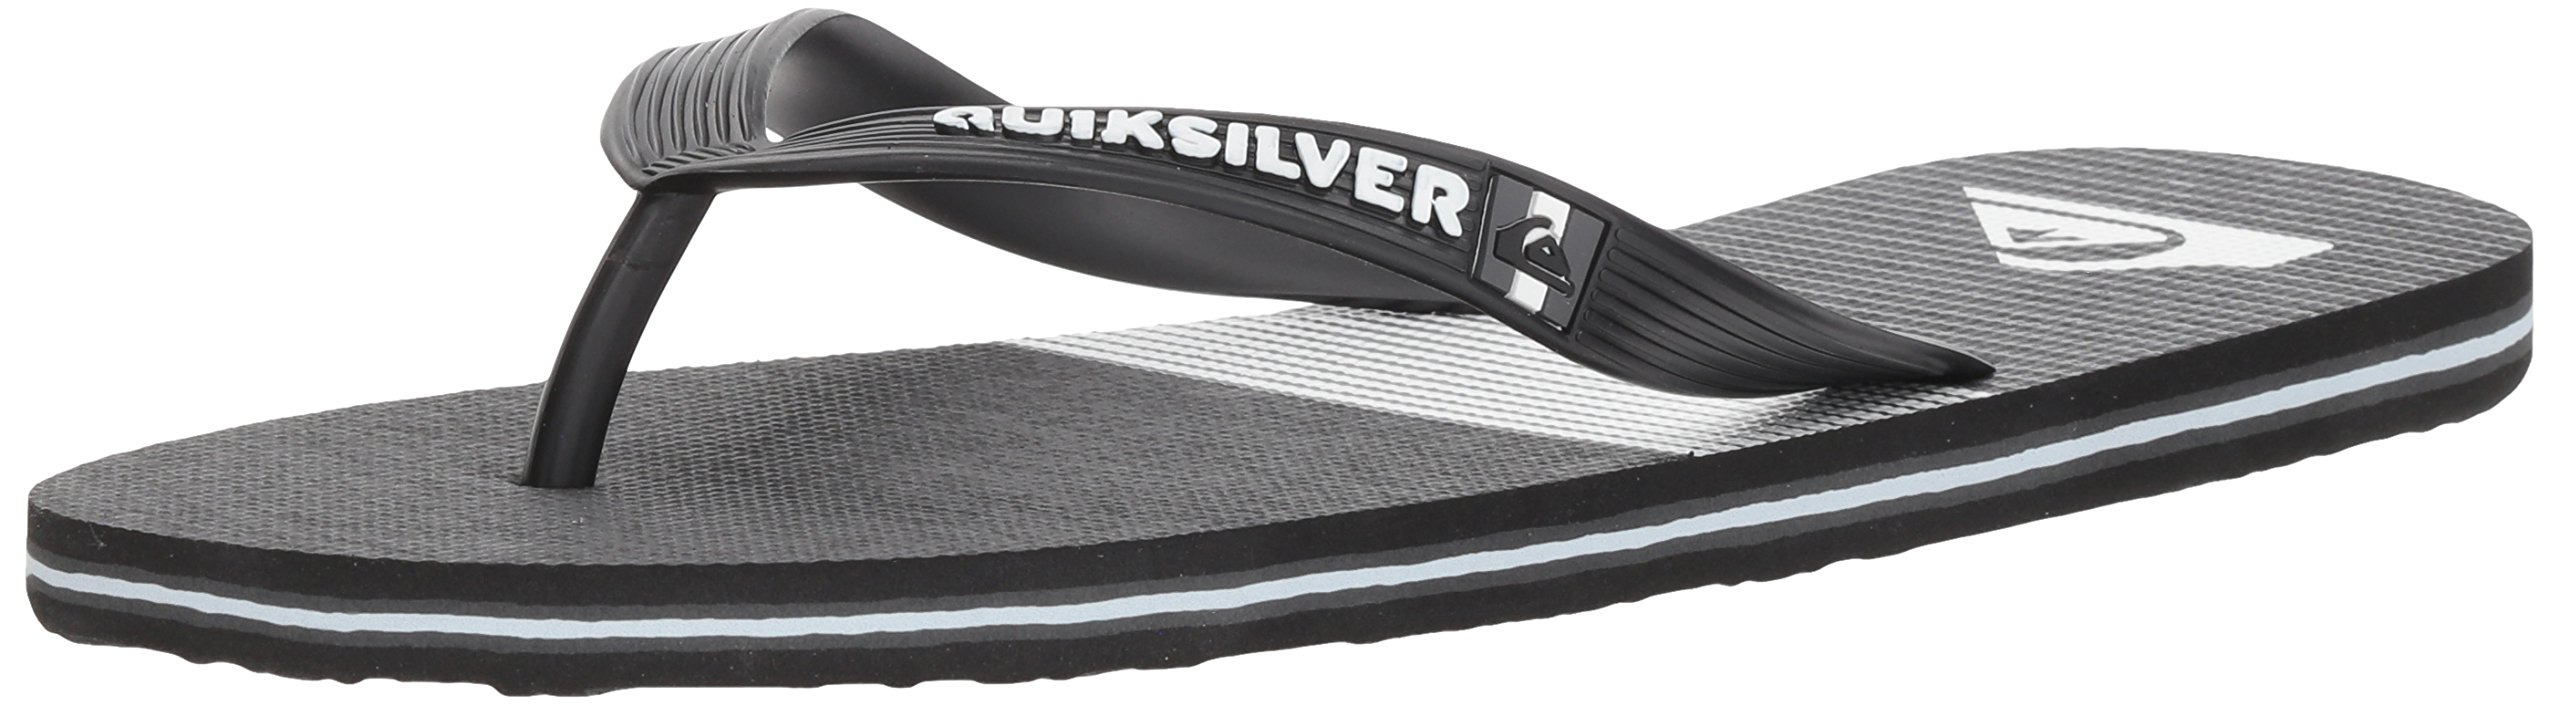 Quiksilver Men's Molokai Tijuana Sandal, Black/Grey/White, 10 M US